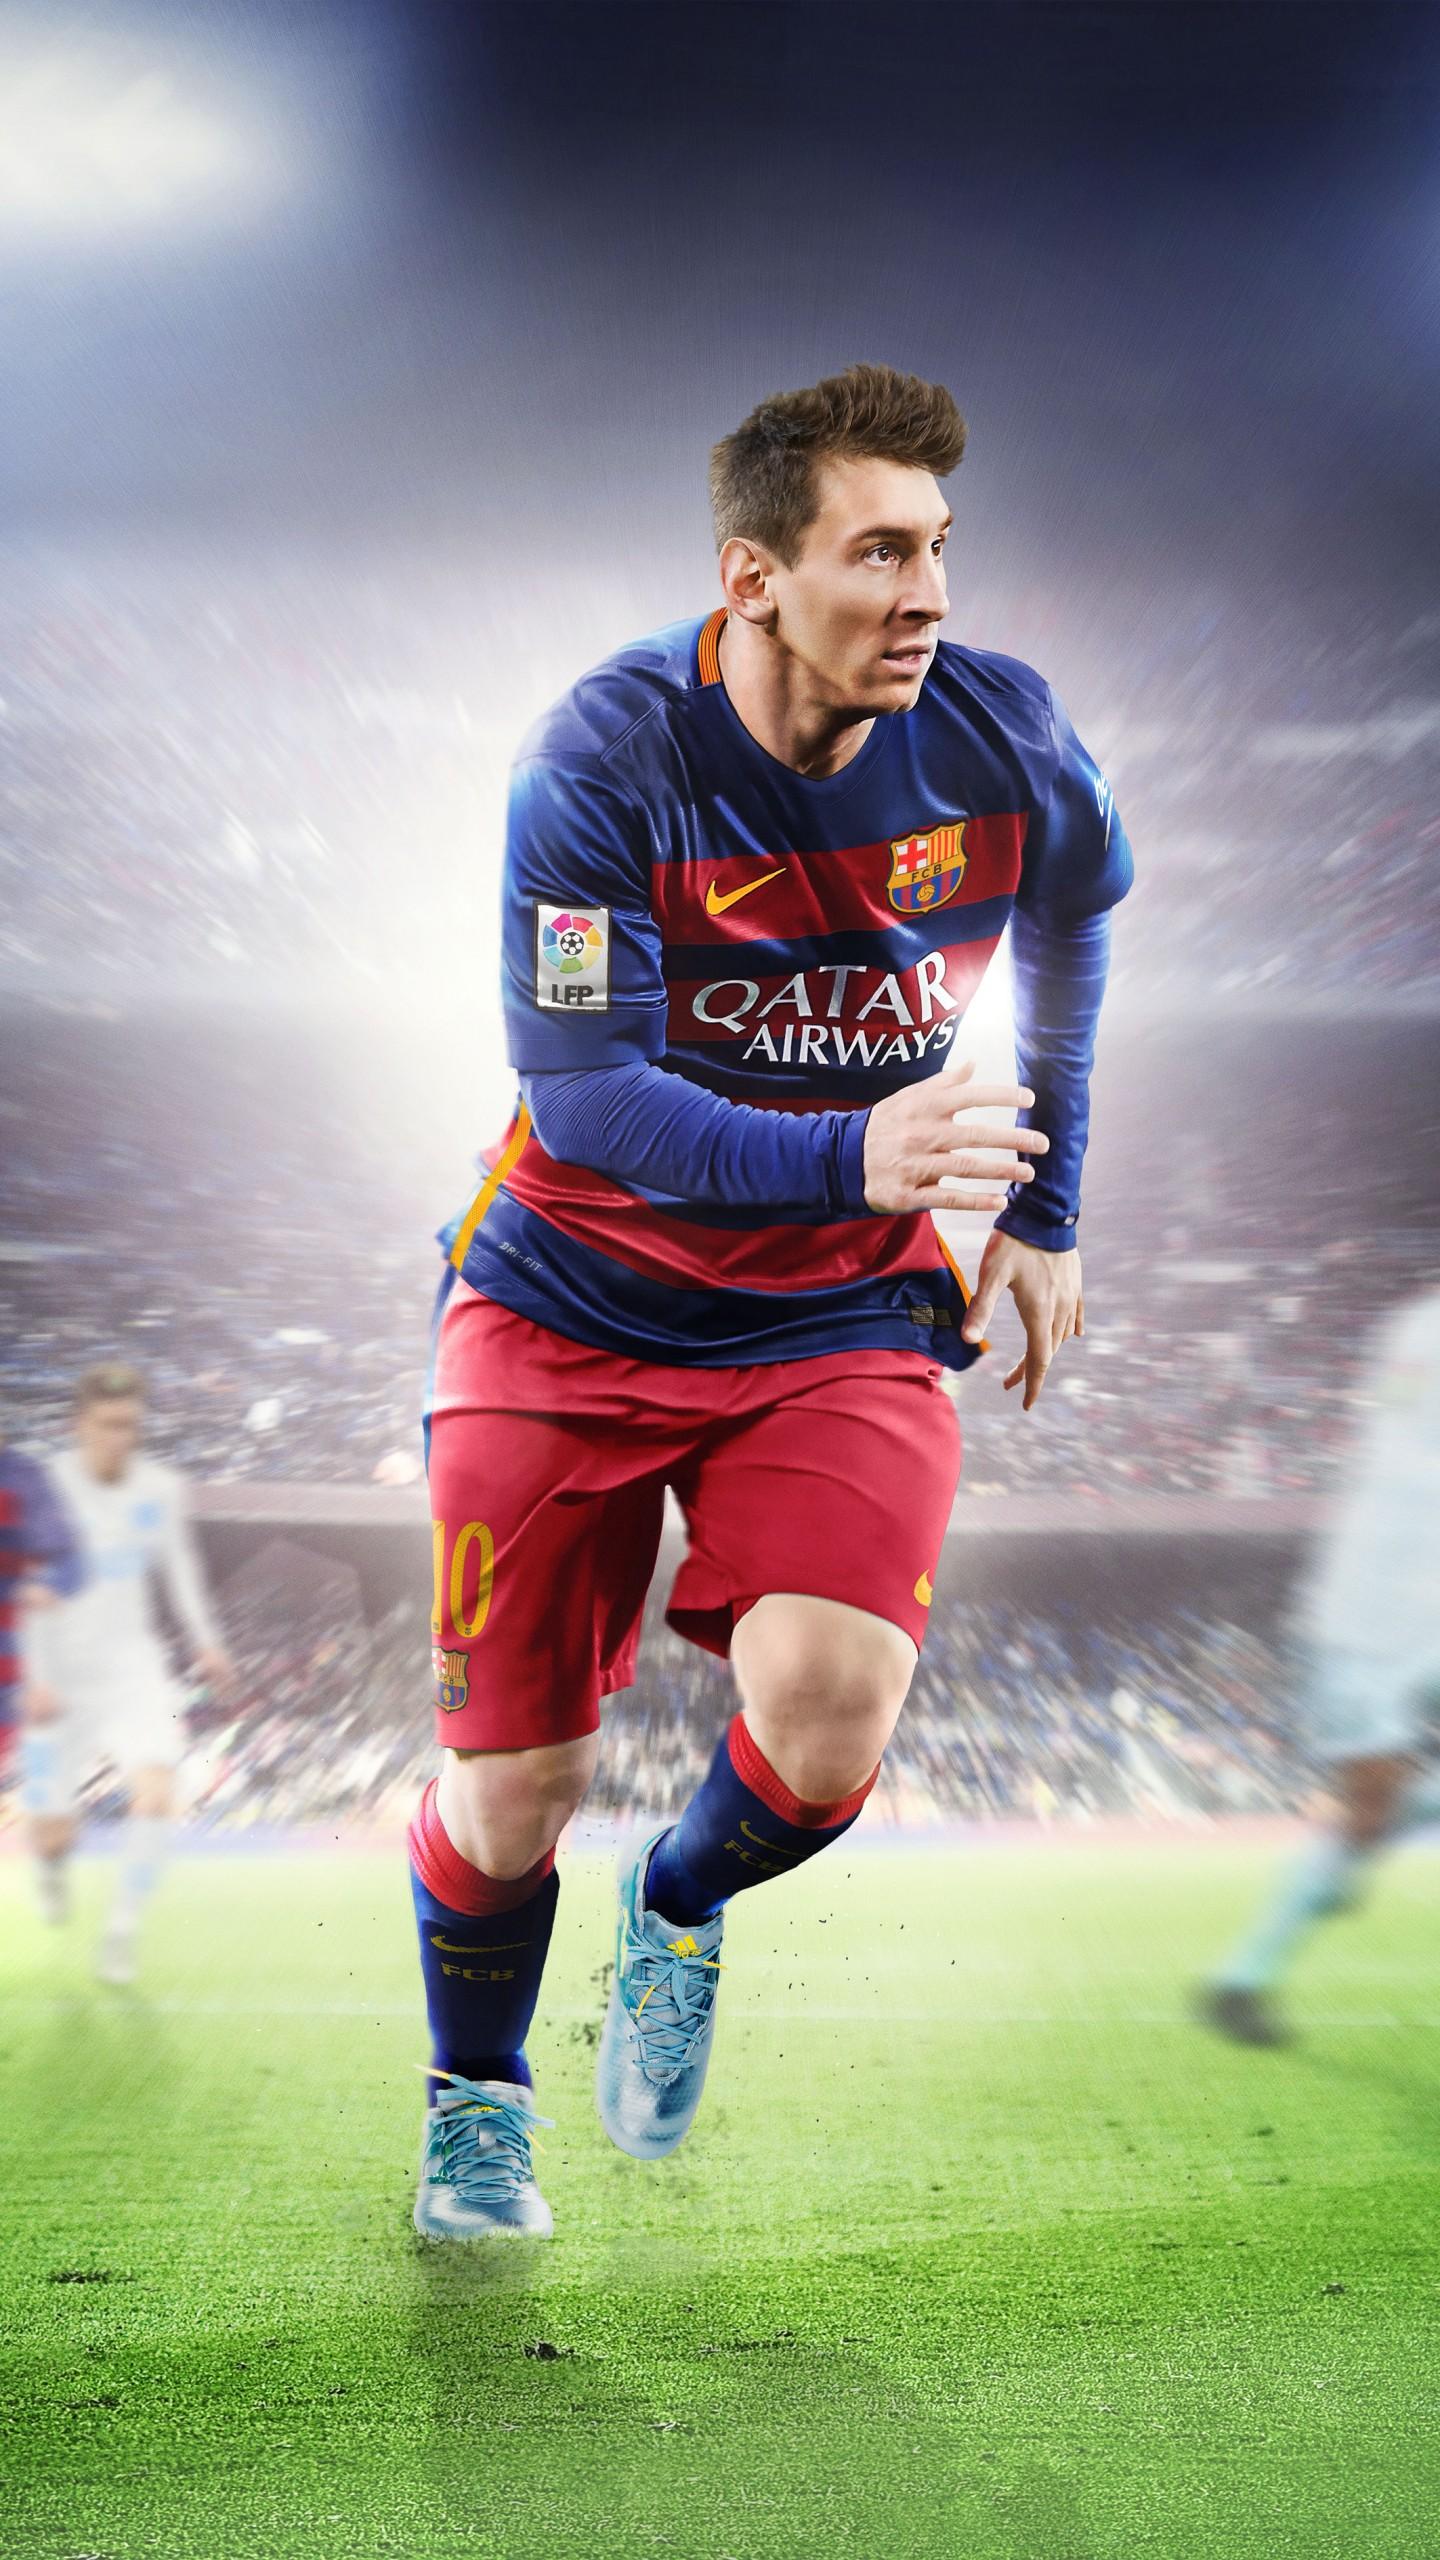 Games / Lionel Messi Wallpaper - Messi Wallpaper Pc 4k , HD Wallpaper & Backgrounds